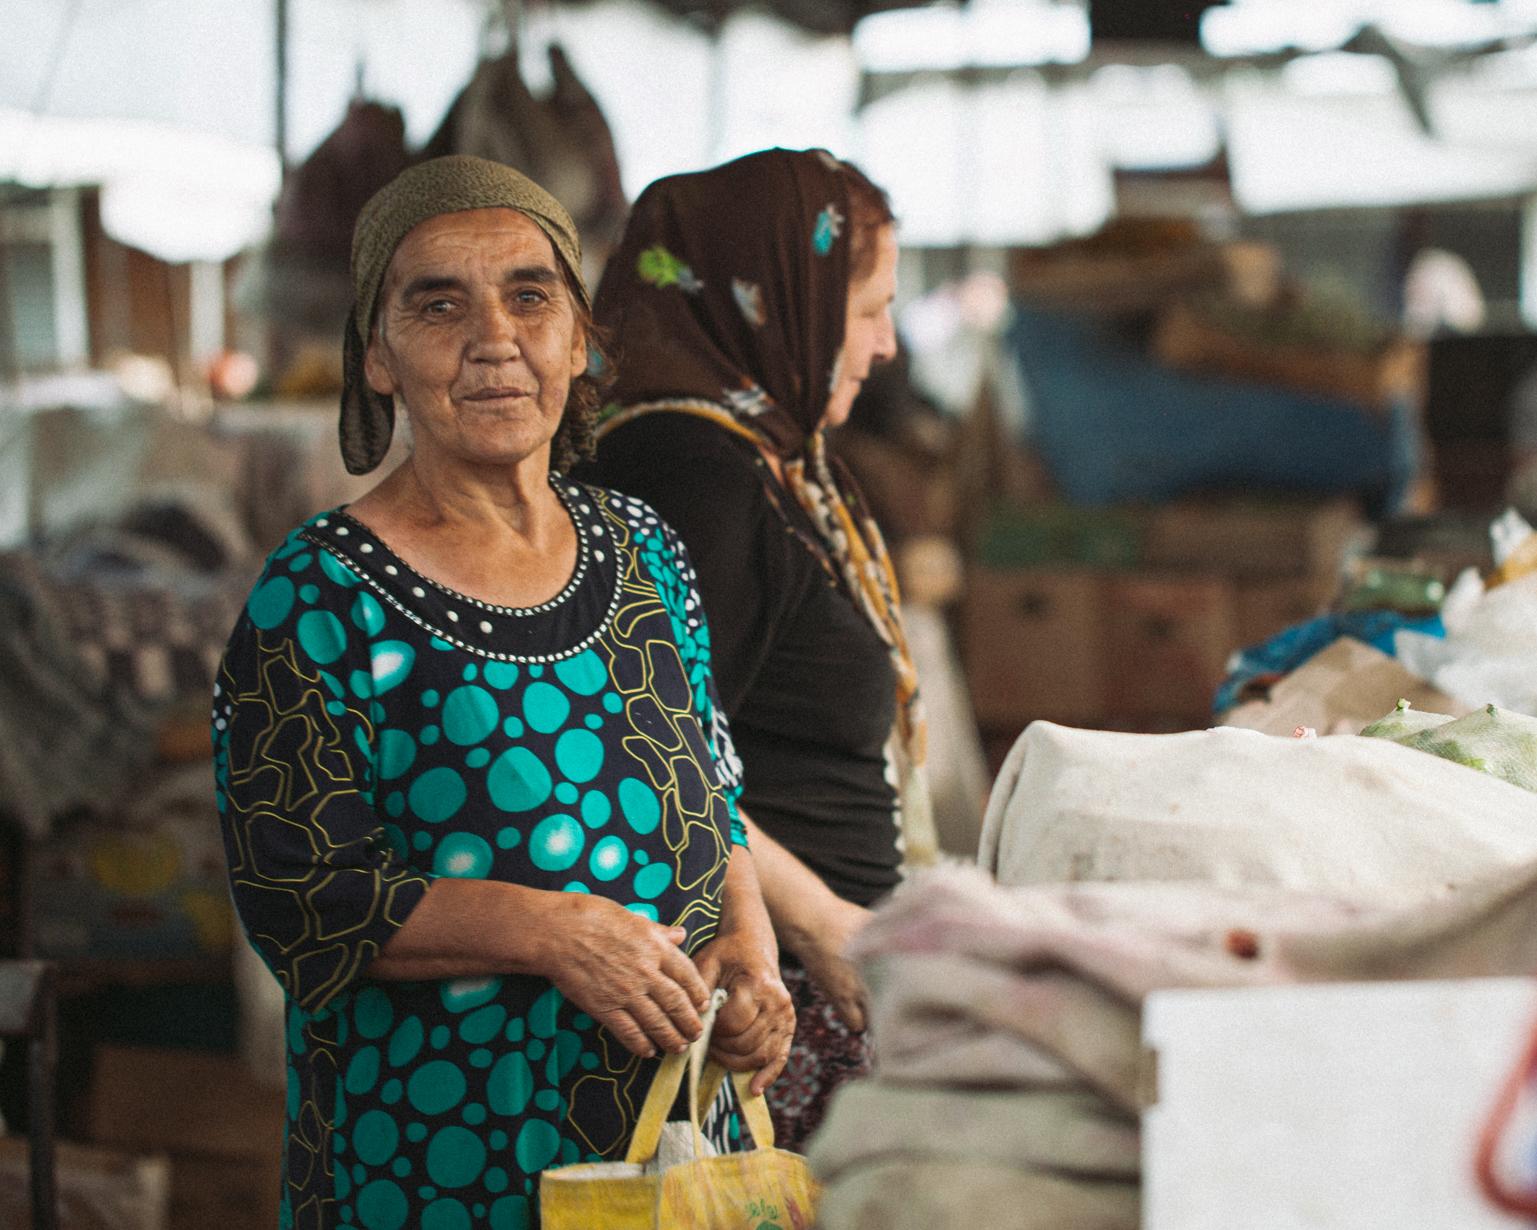 Nabat at the bazaar. Shaki, 2015